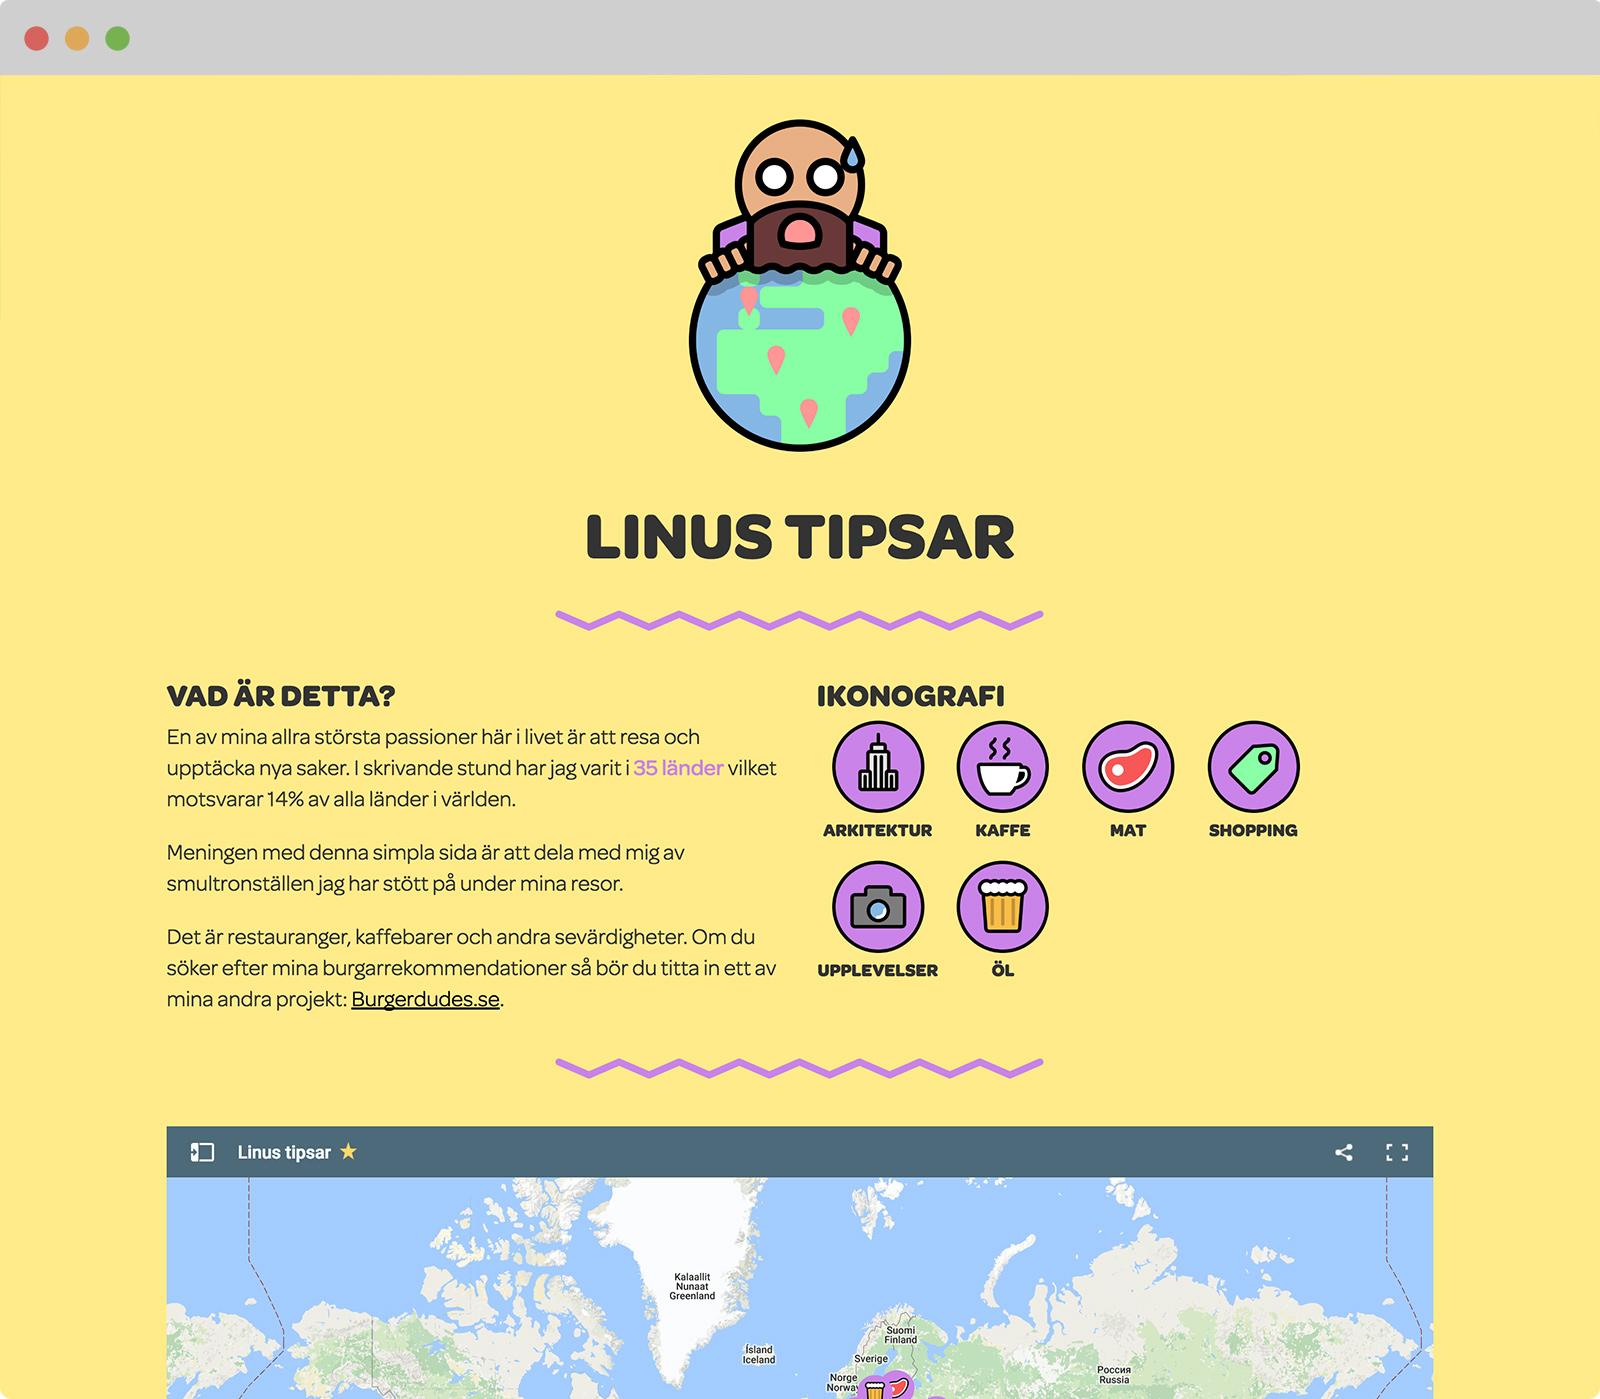 linus-tipsar-web